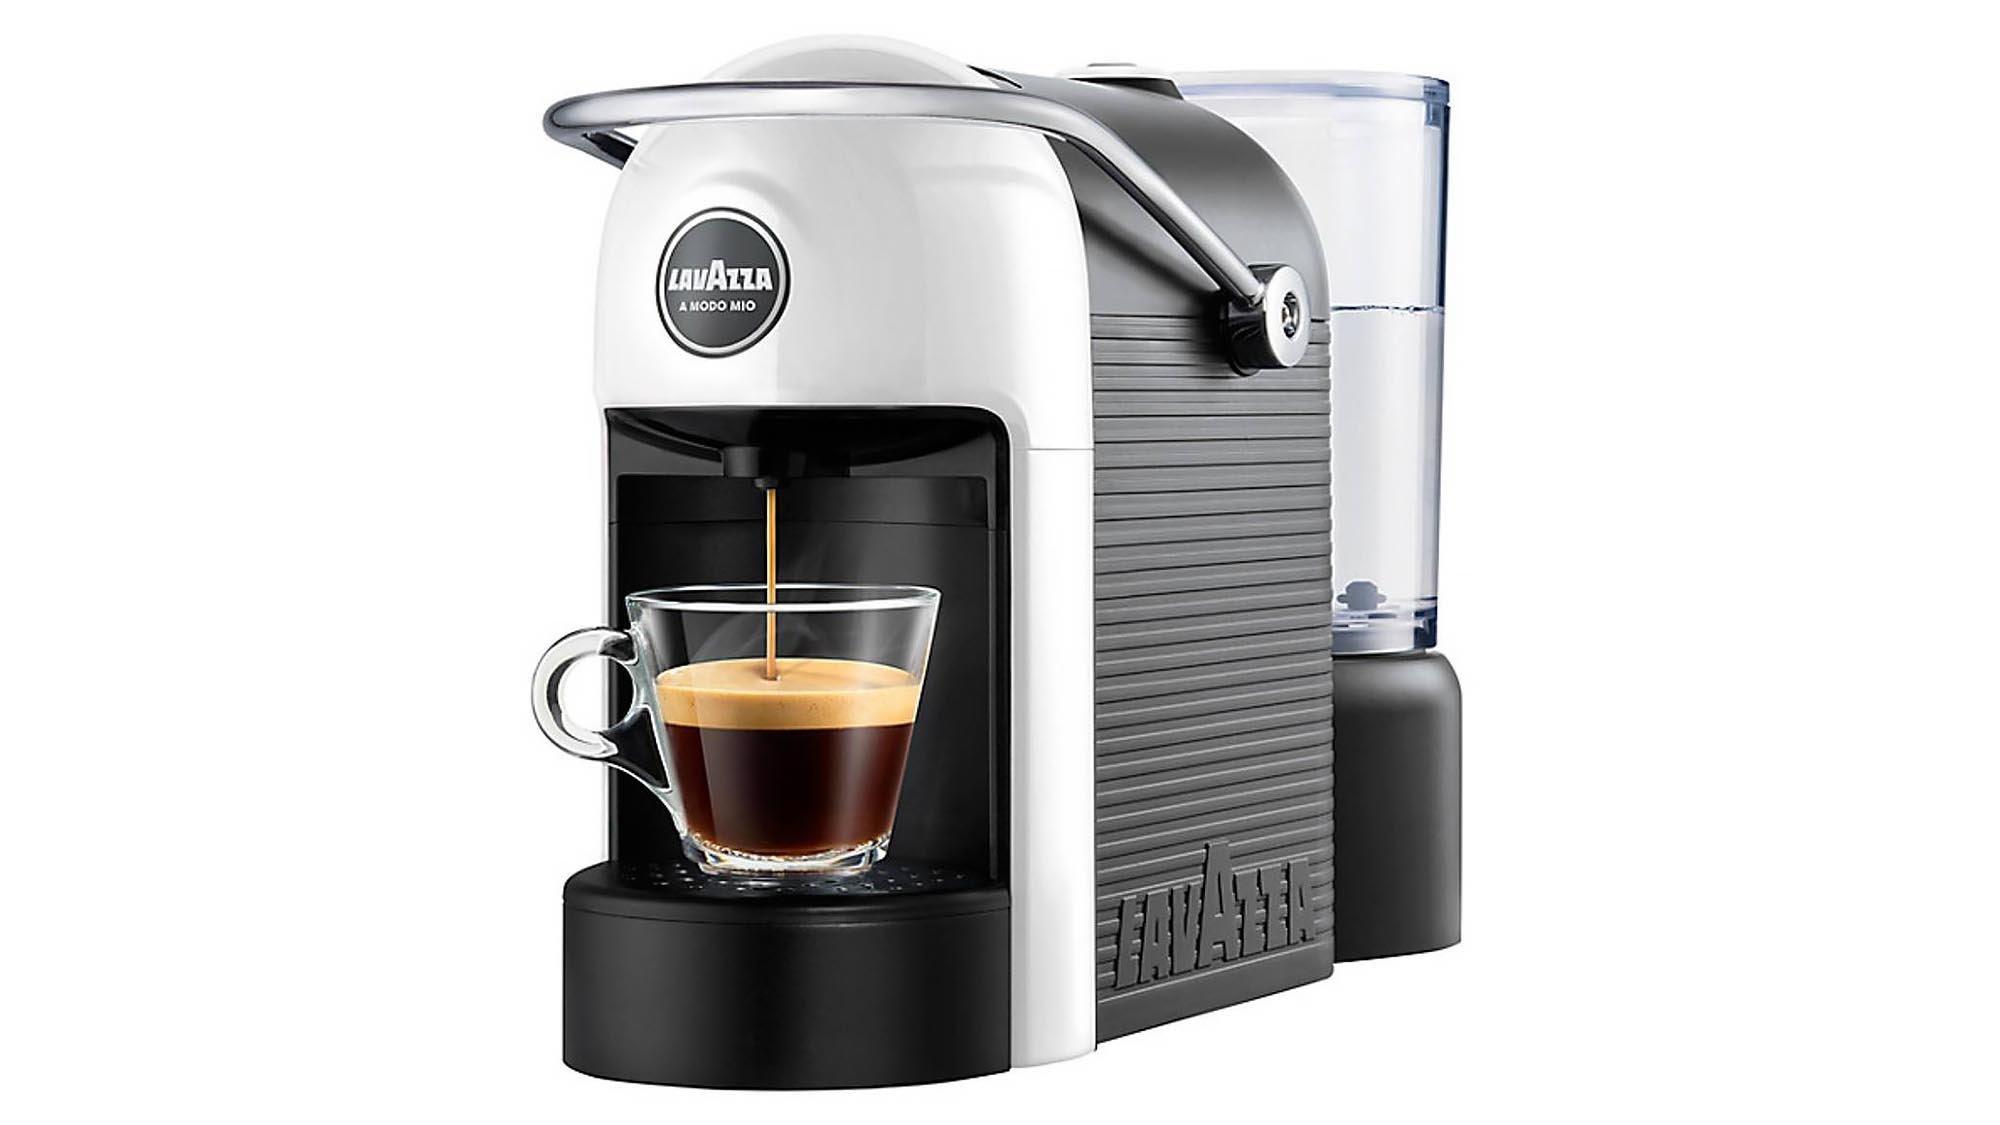 Top coffee makers uk